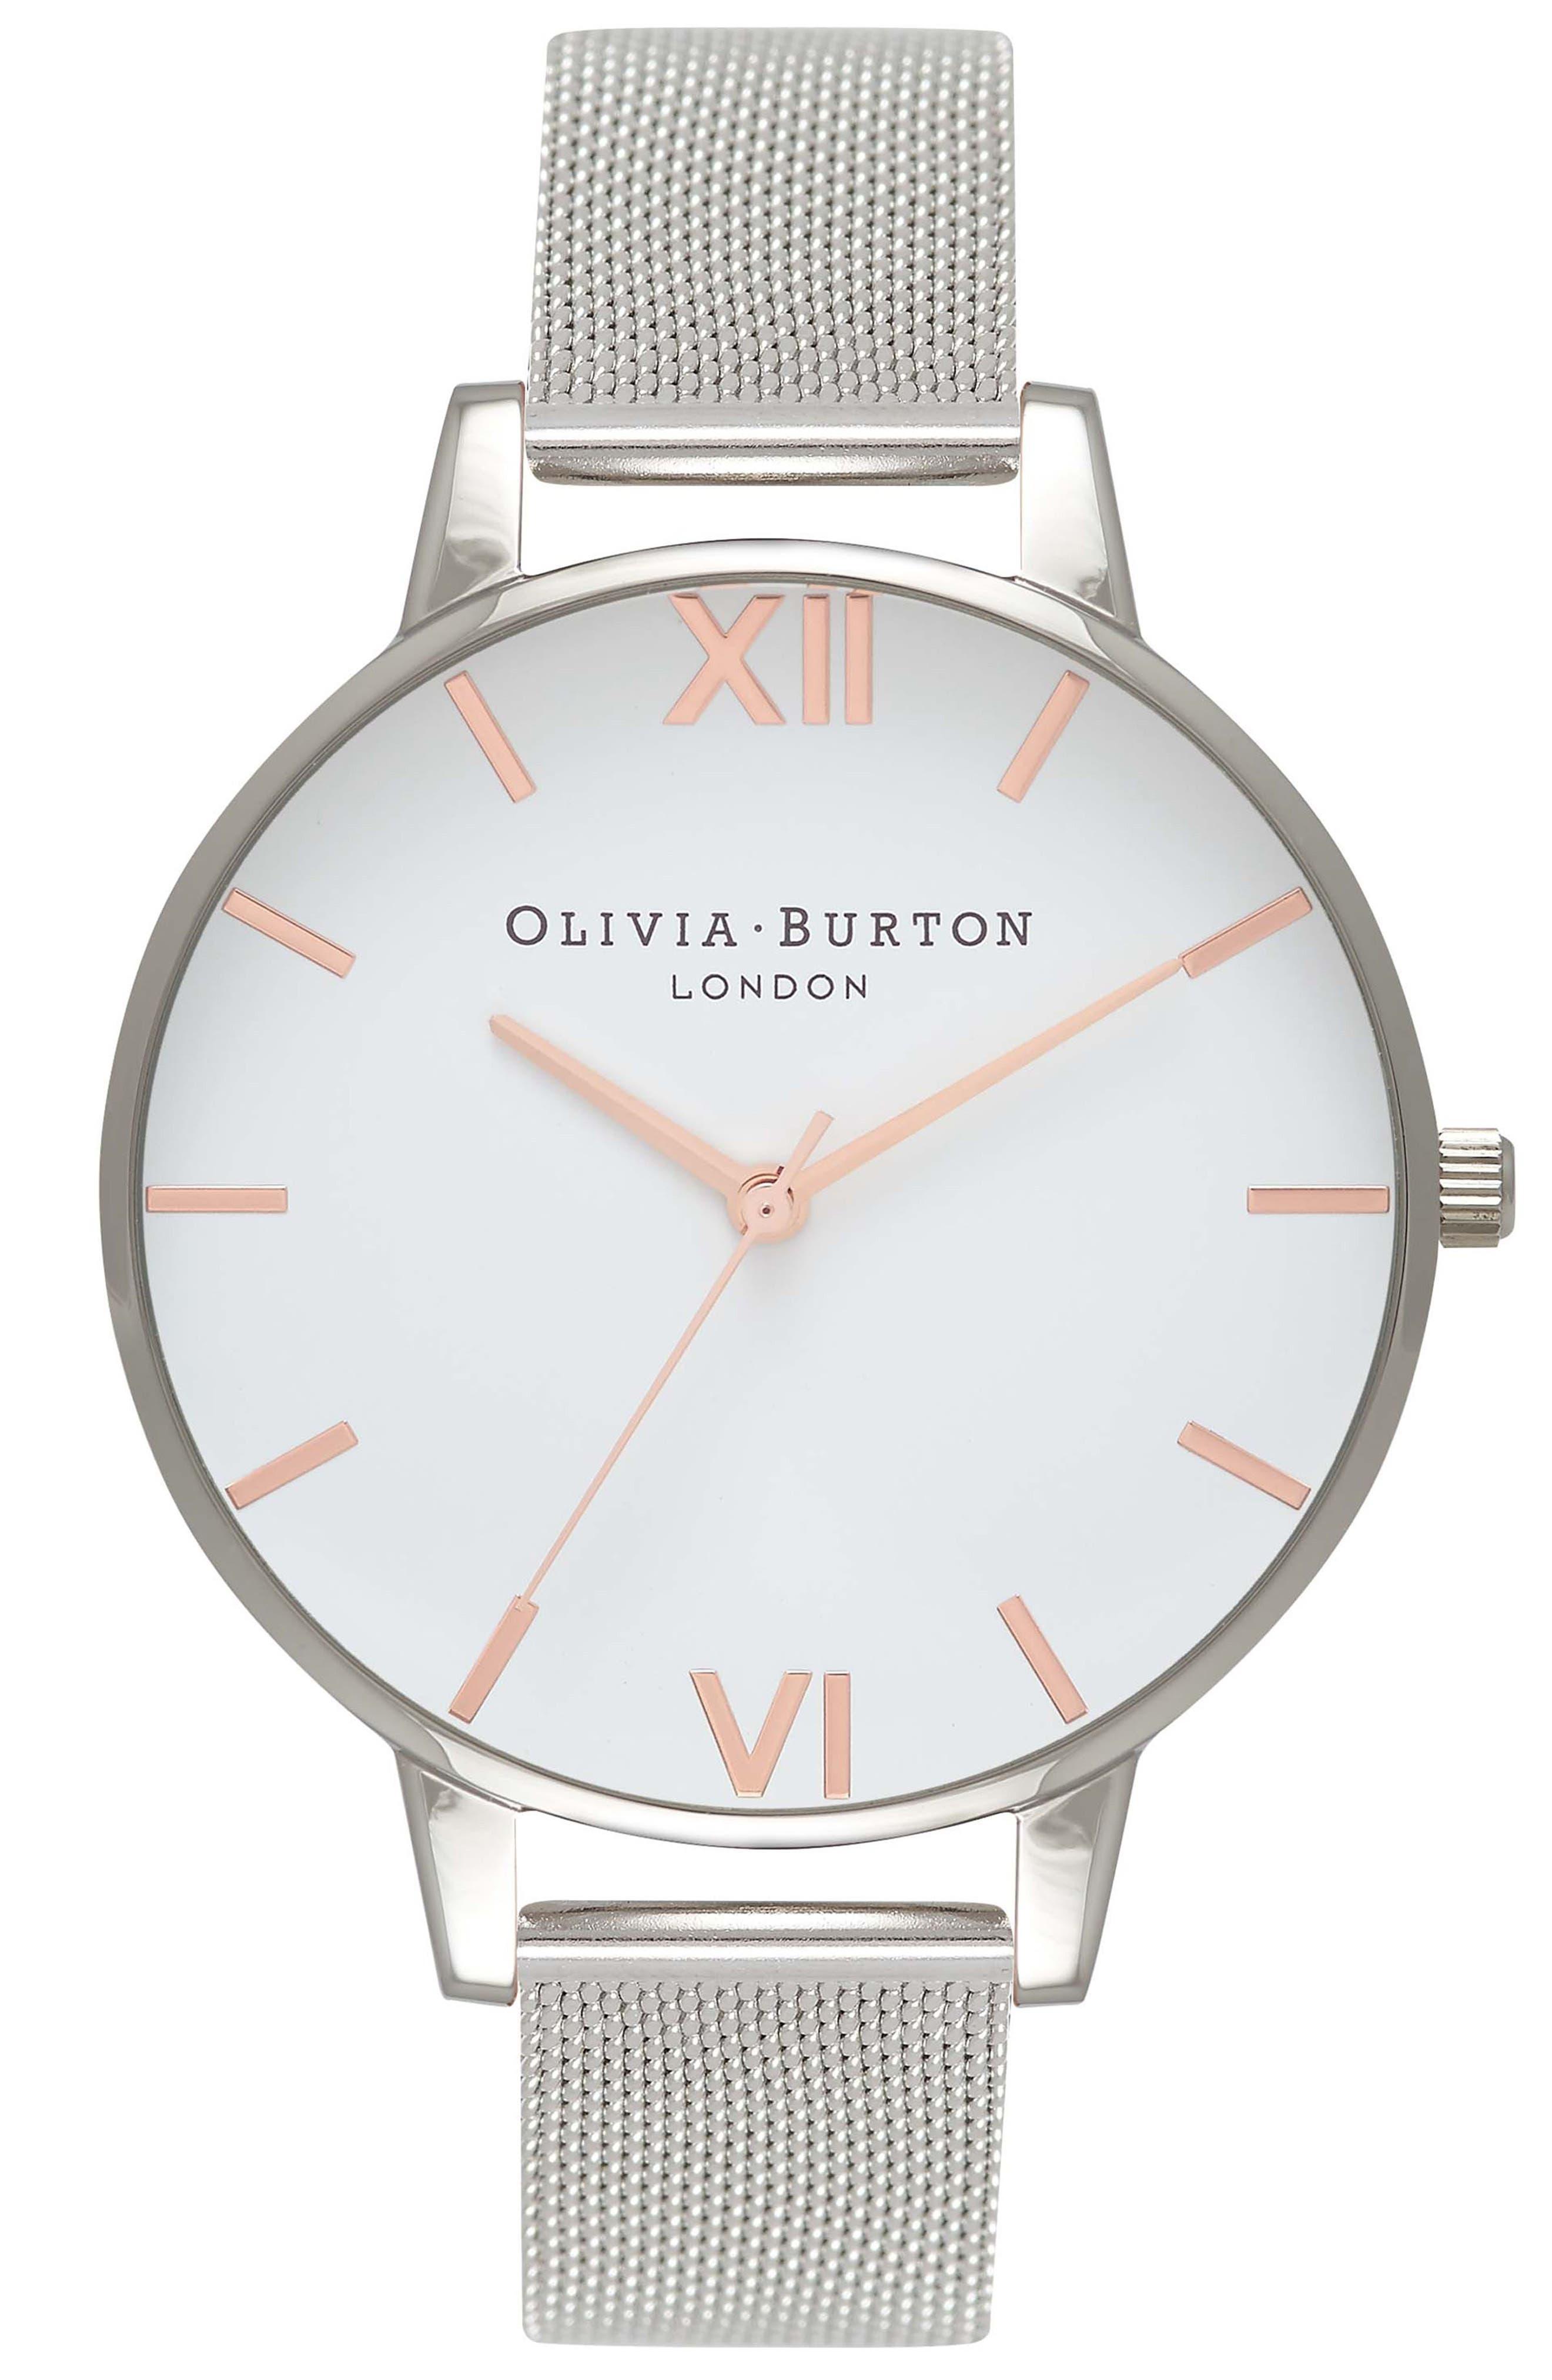 OLIVIA BURTON, Mesh Strap Watch, 38mm, Main thumbnail 1, color, SILVER/ WHITE/ ROSE GOLD